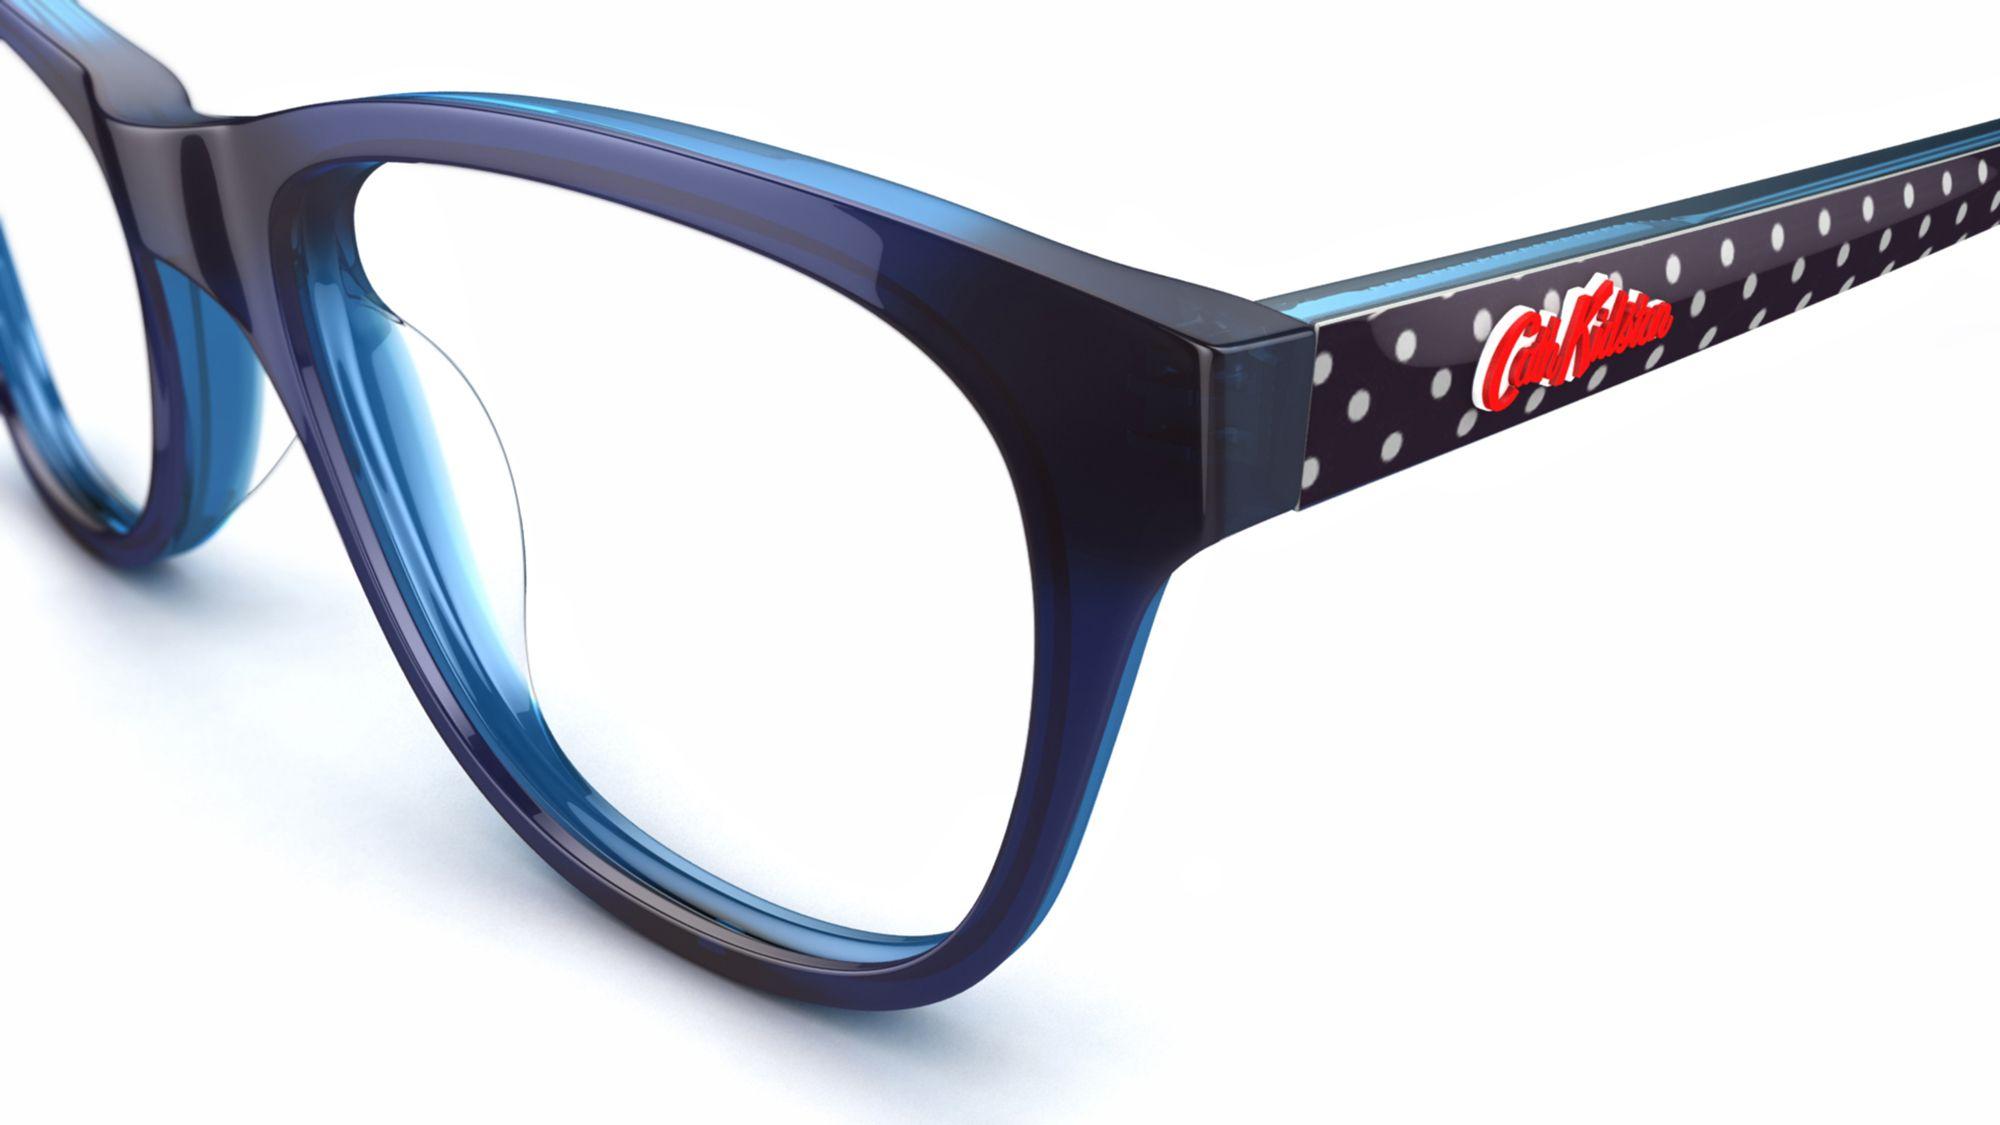 2beabd7ac6 Cath Kidston glasses - CATH KIDSTON TEEN 01